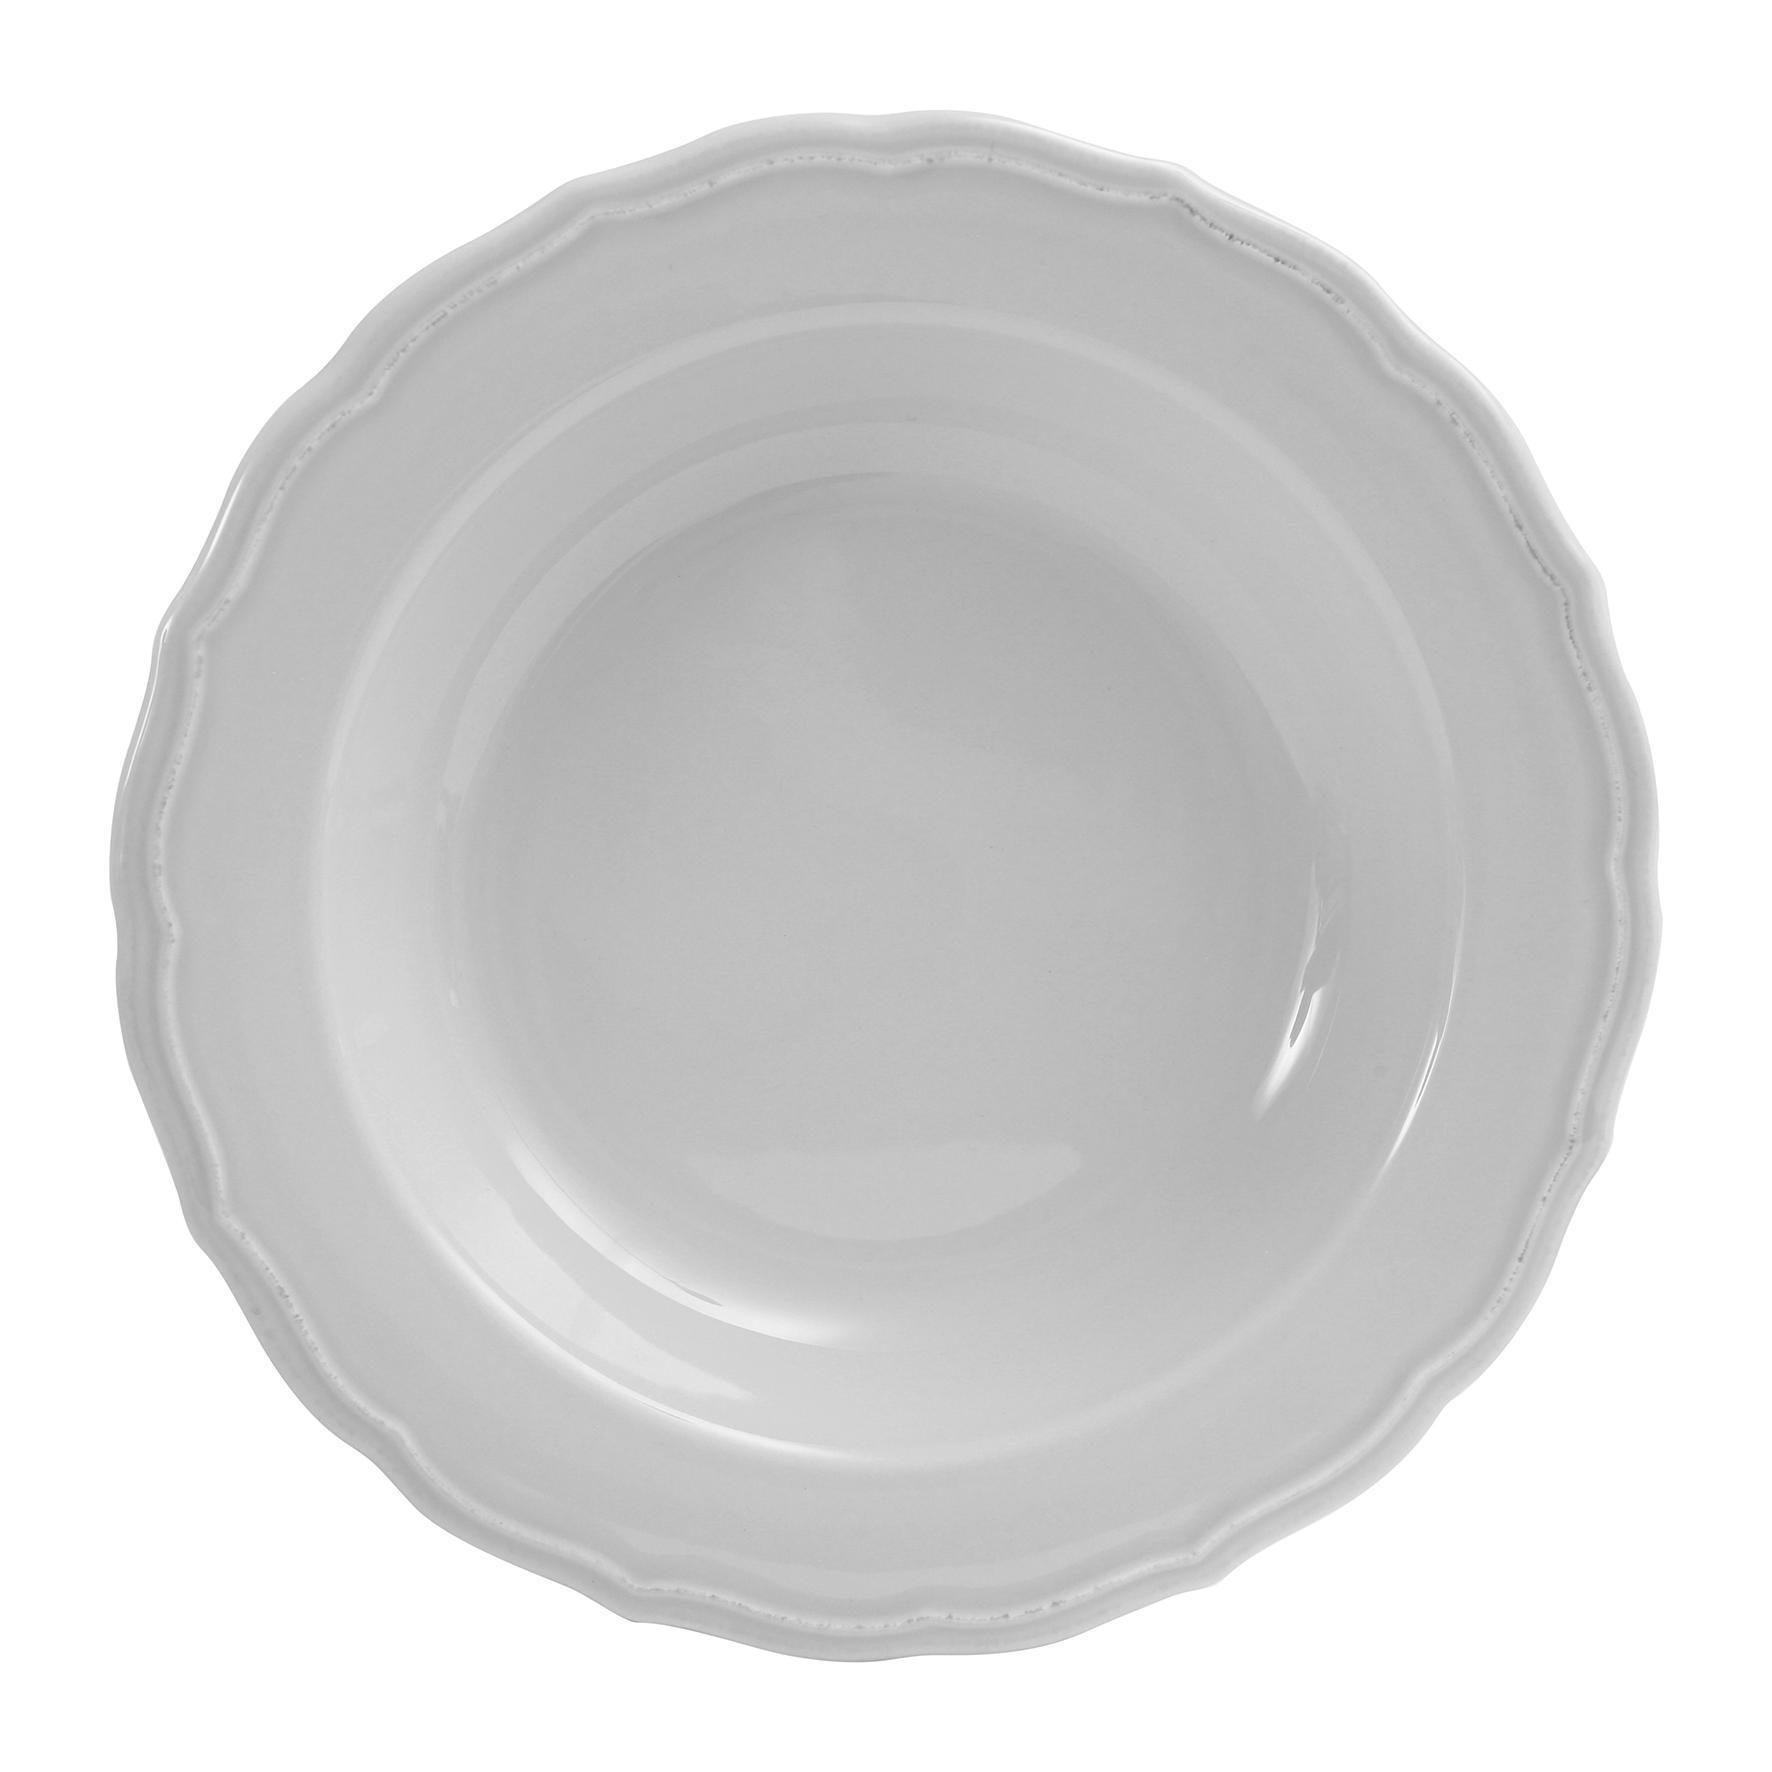 CÔTÉ TABLE Hluboký talíř Carole gris, šedá barva, keramika